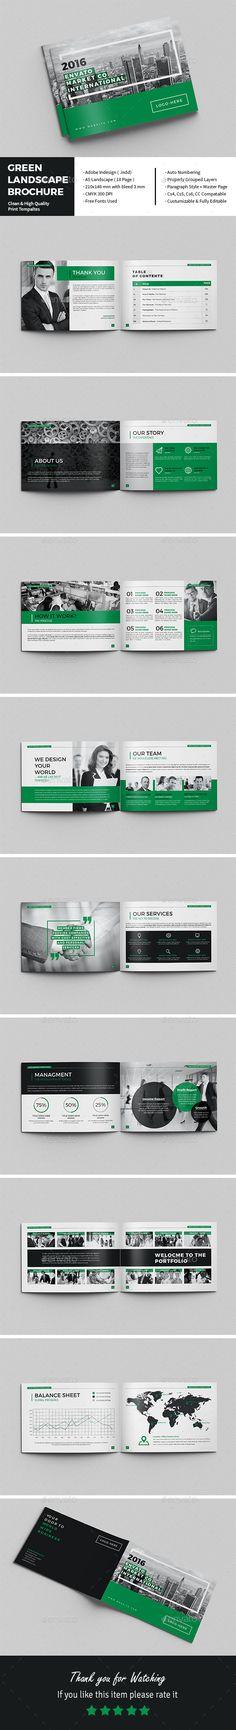 Landscape Multi Purpose Brochure Indesign Templates Brochures And